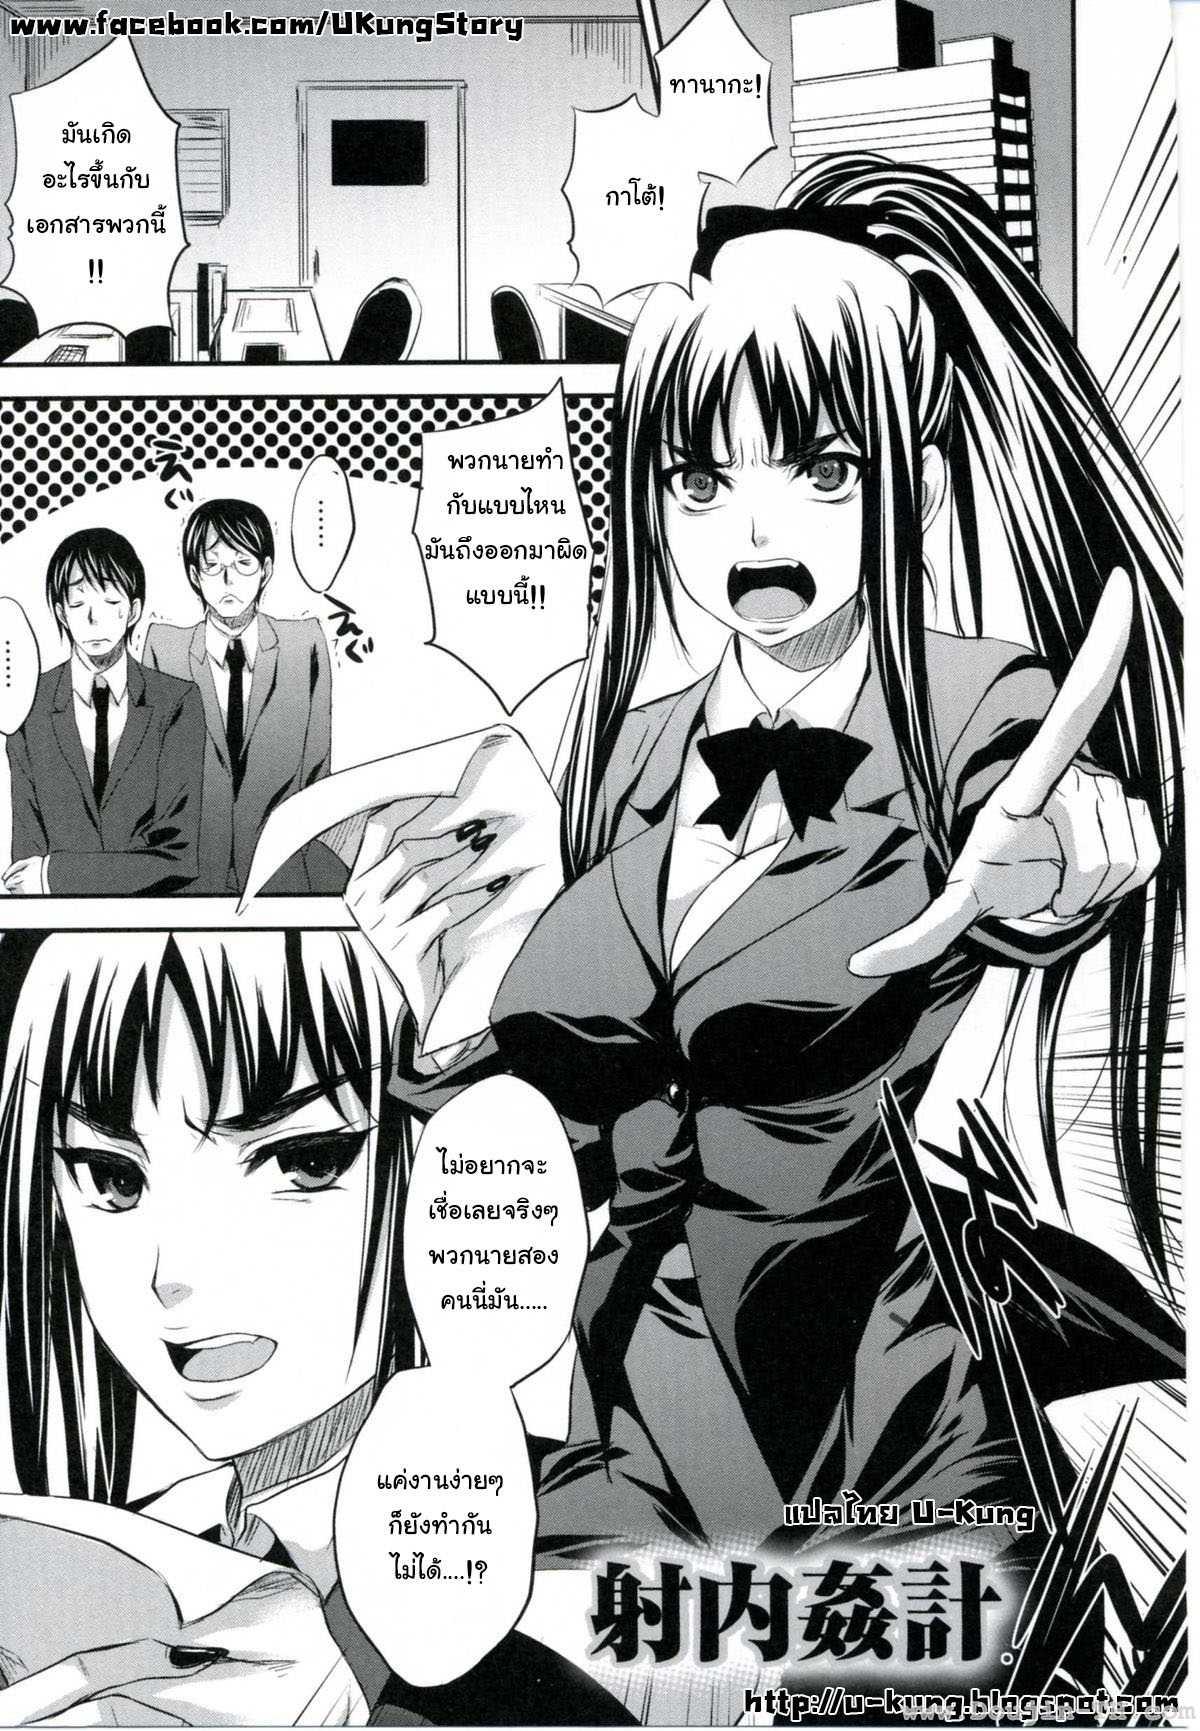 kobayashi-yutaka-alemateorema-shanai-kankei-comic-angel-club-2010-02